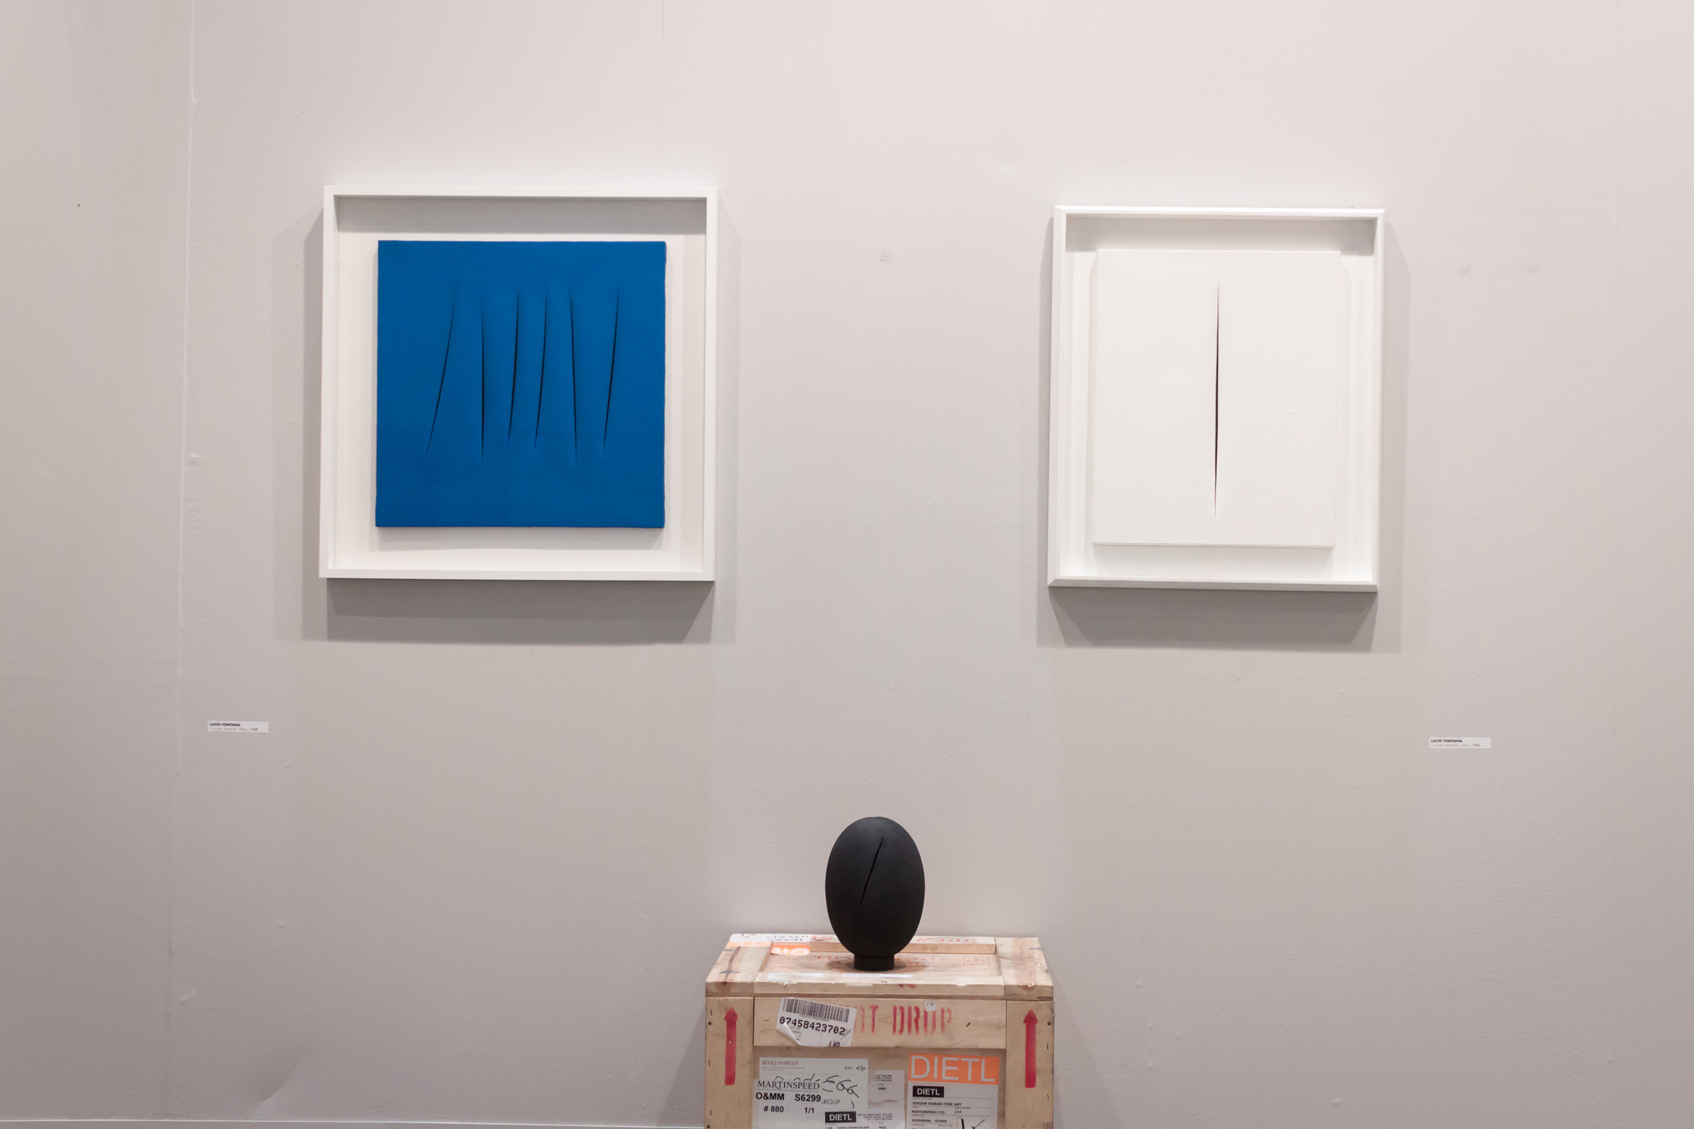 Мультимедиа-арт-музей Лучо Фонтана